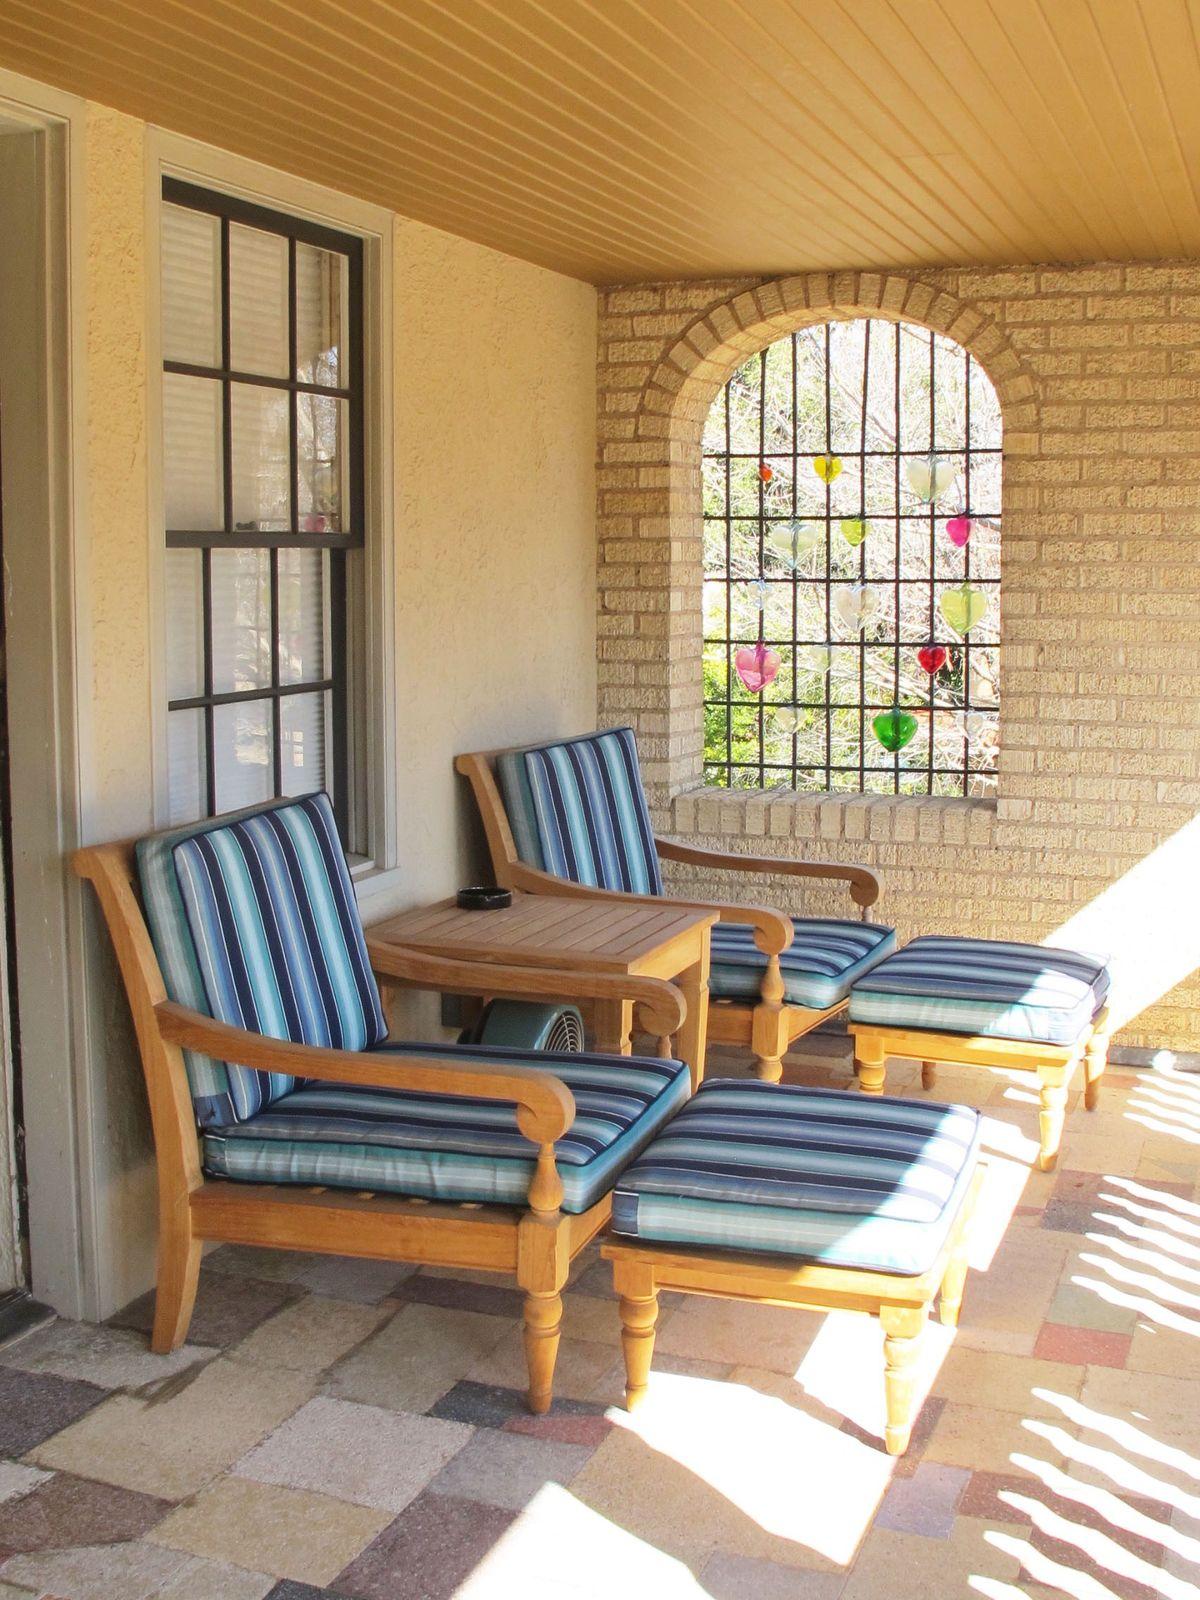 Historic Hutsell Mediterranean Home Photo Video Shoot Location 44.jpg